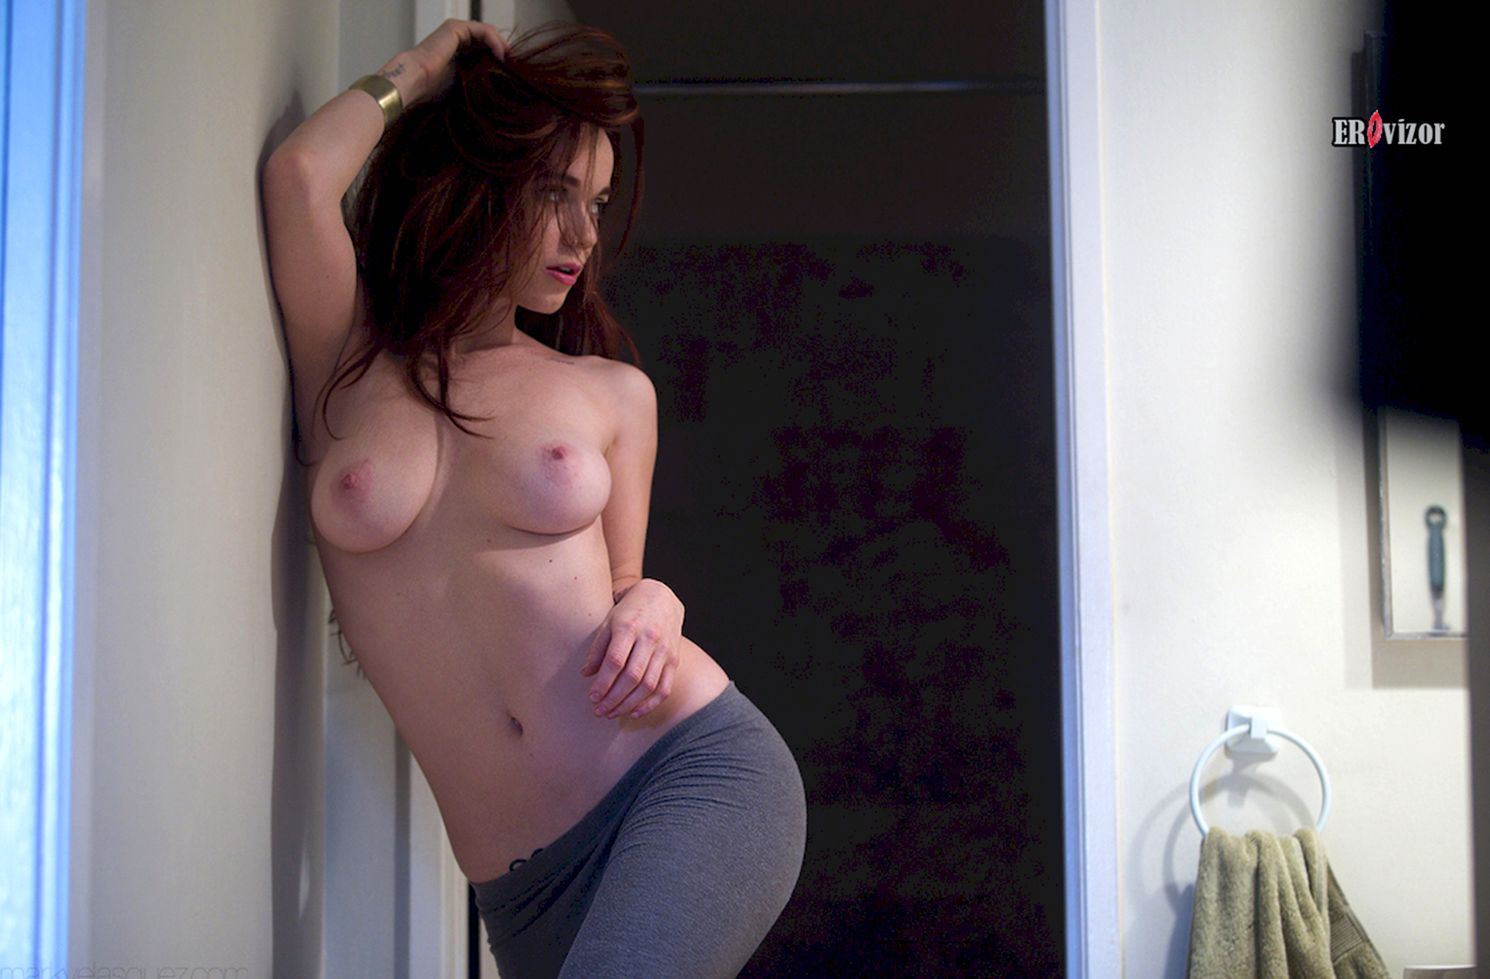 legkaya_erotica-erovizor (75)